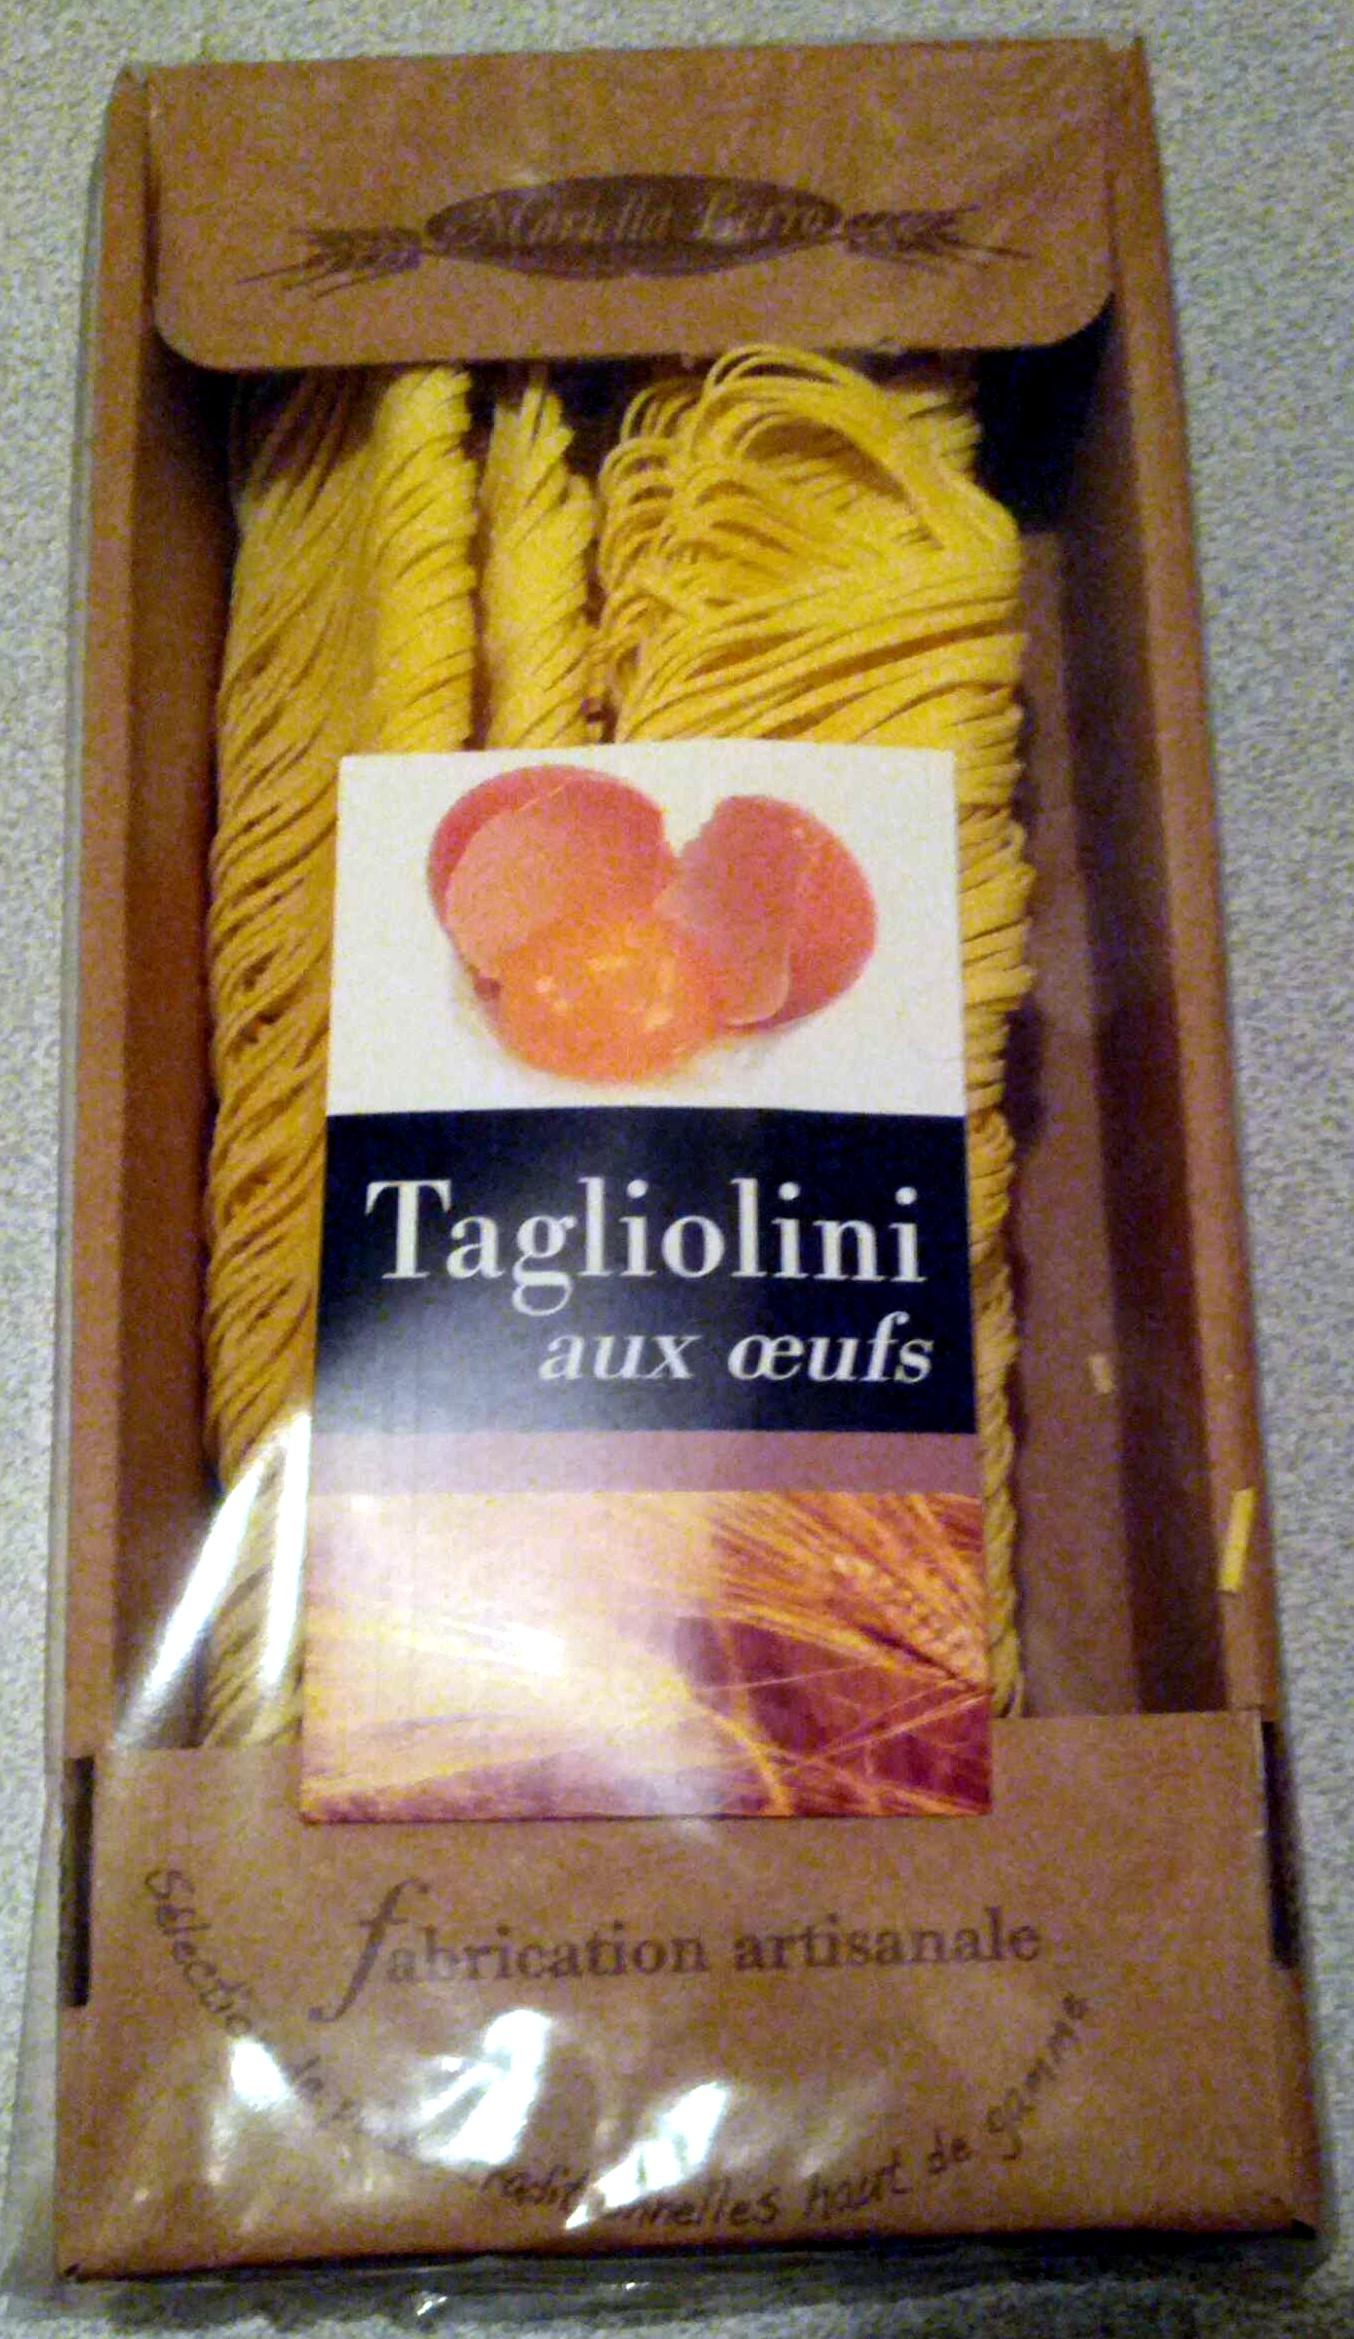 Tagliolini aux Œufs - Produit